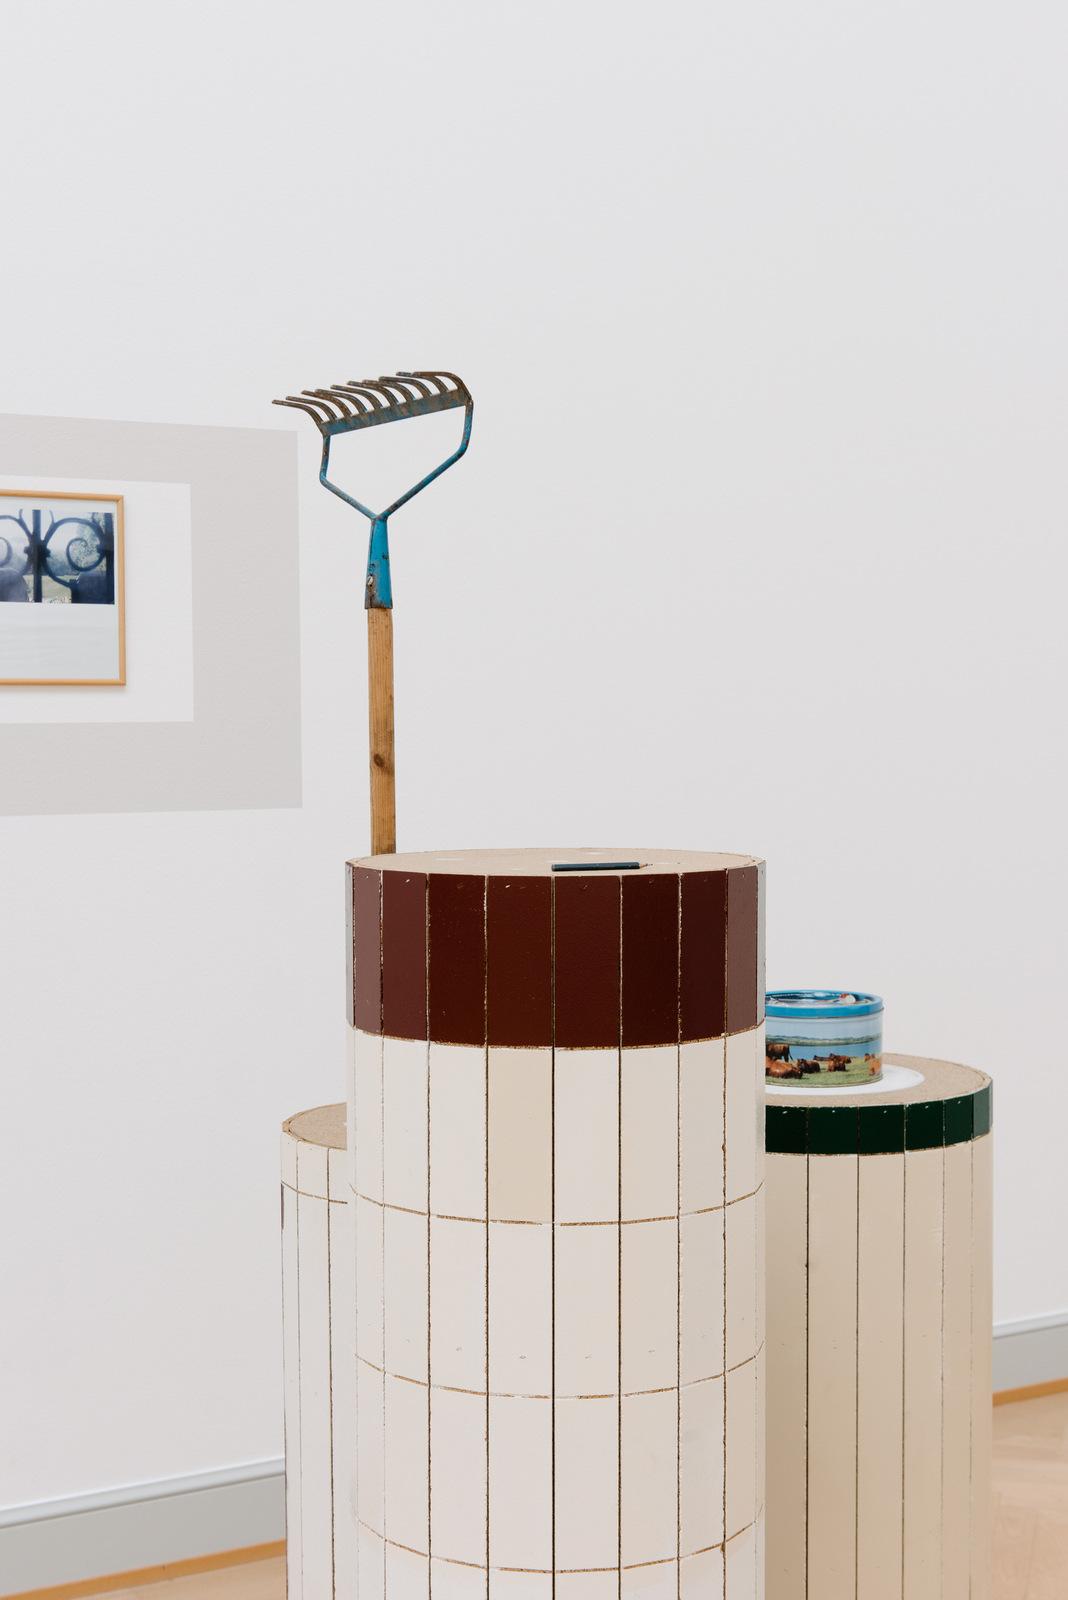 13_Installationsansicht_St.Gallen__Foto_Sebastian_Stadler